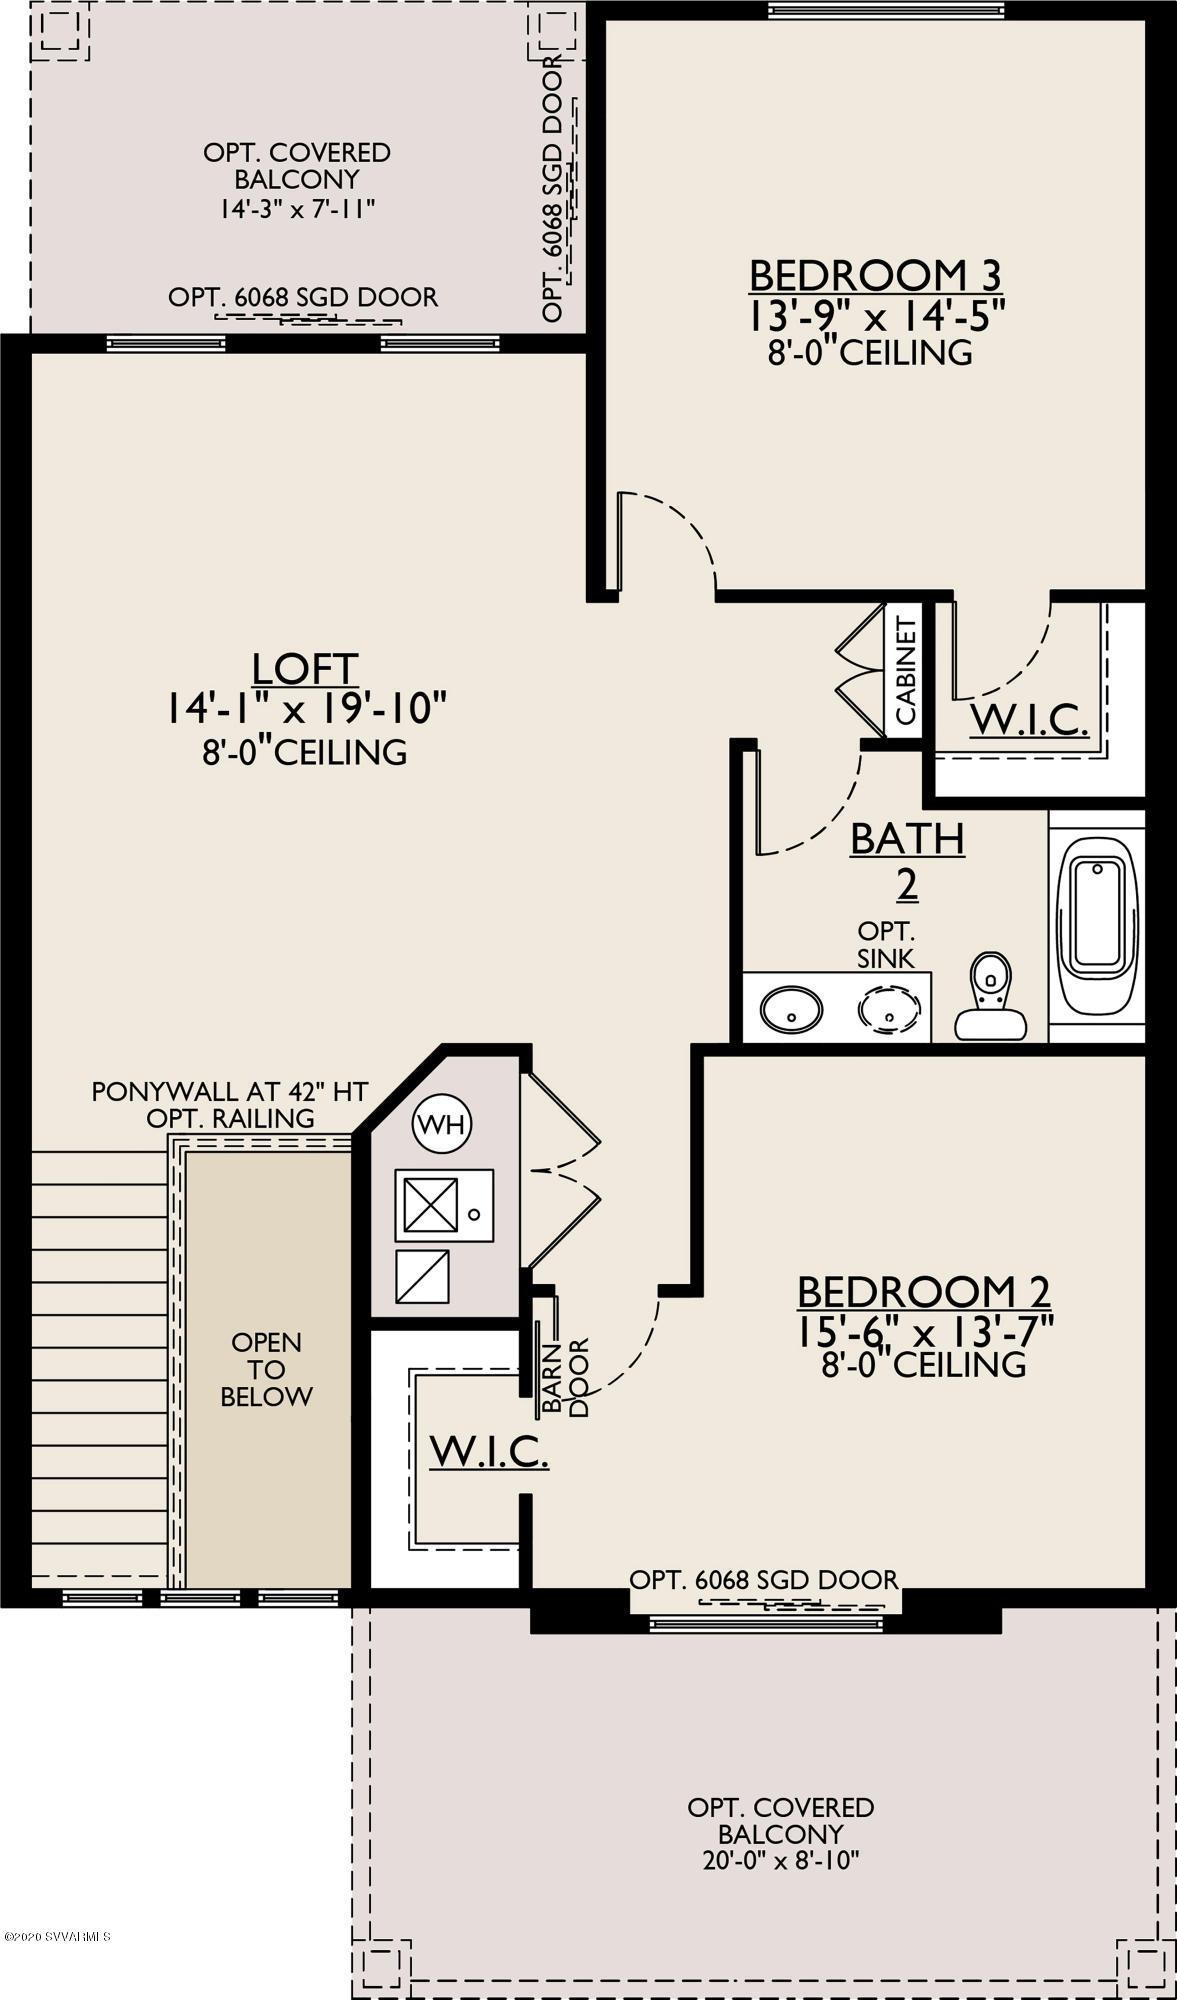 3917 Positano Place Sedona, AZ 86336